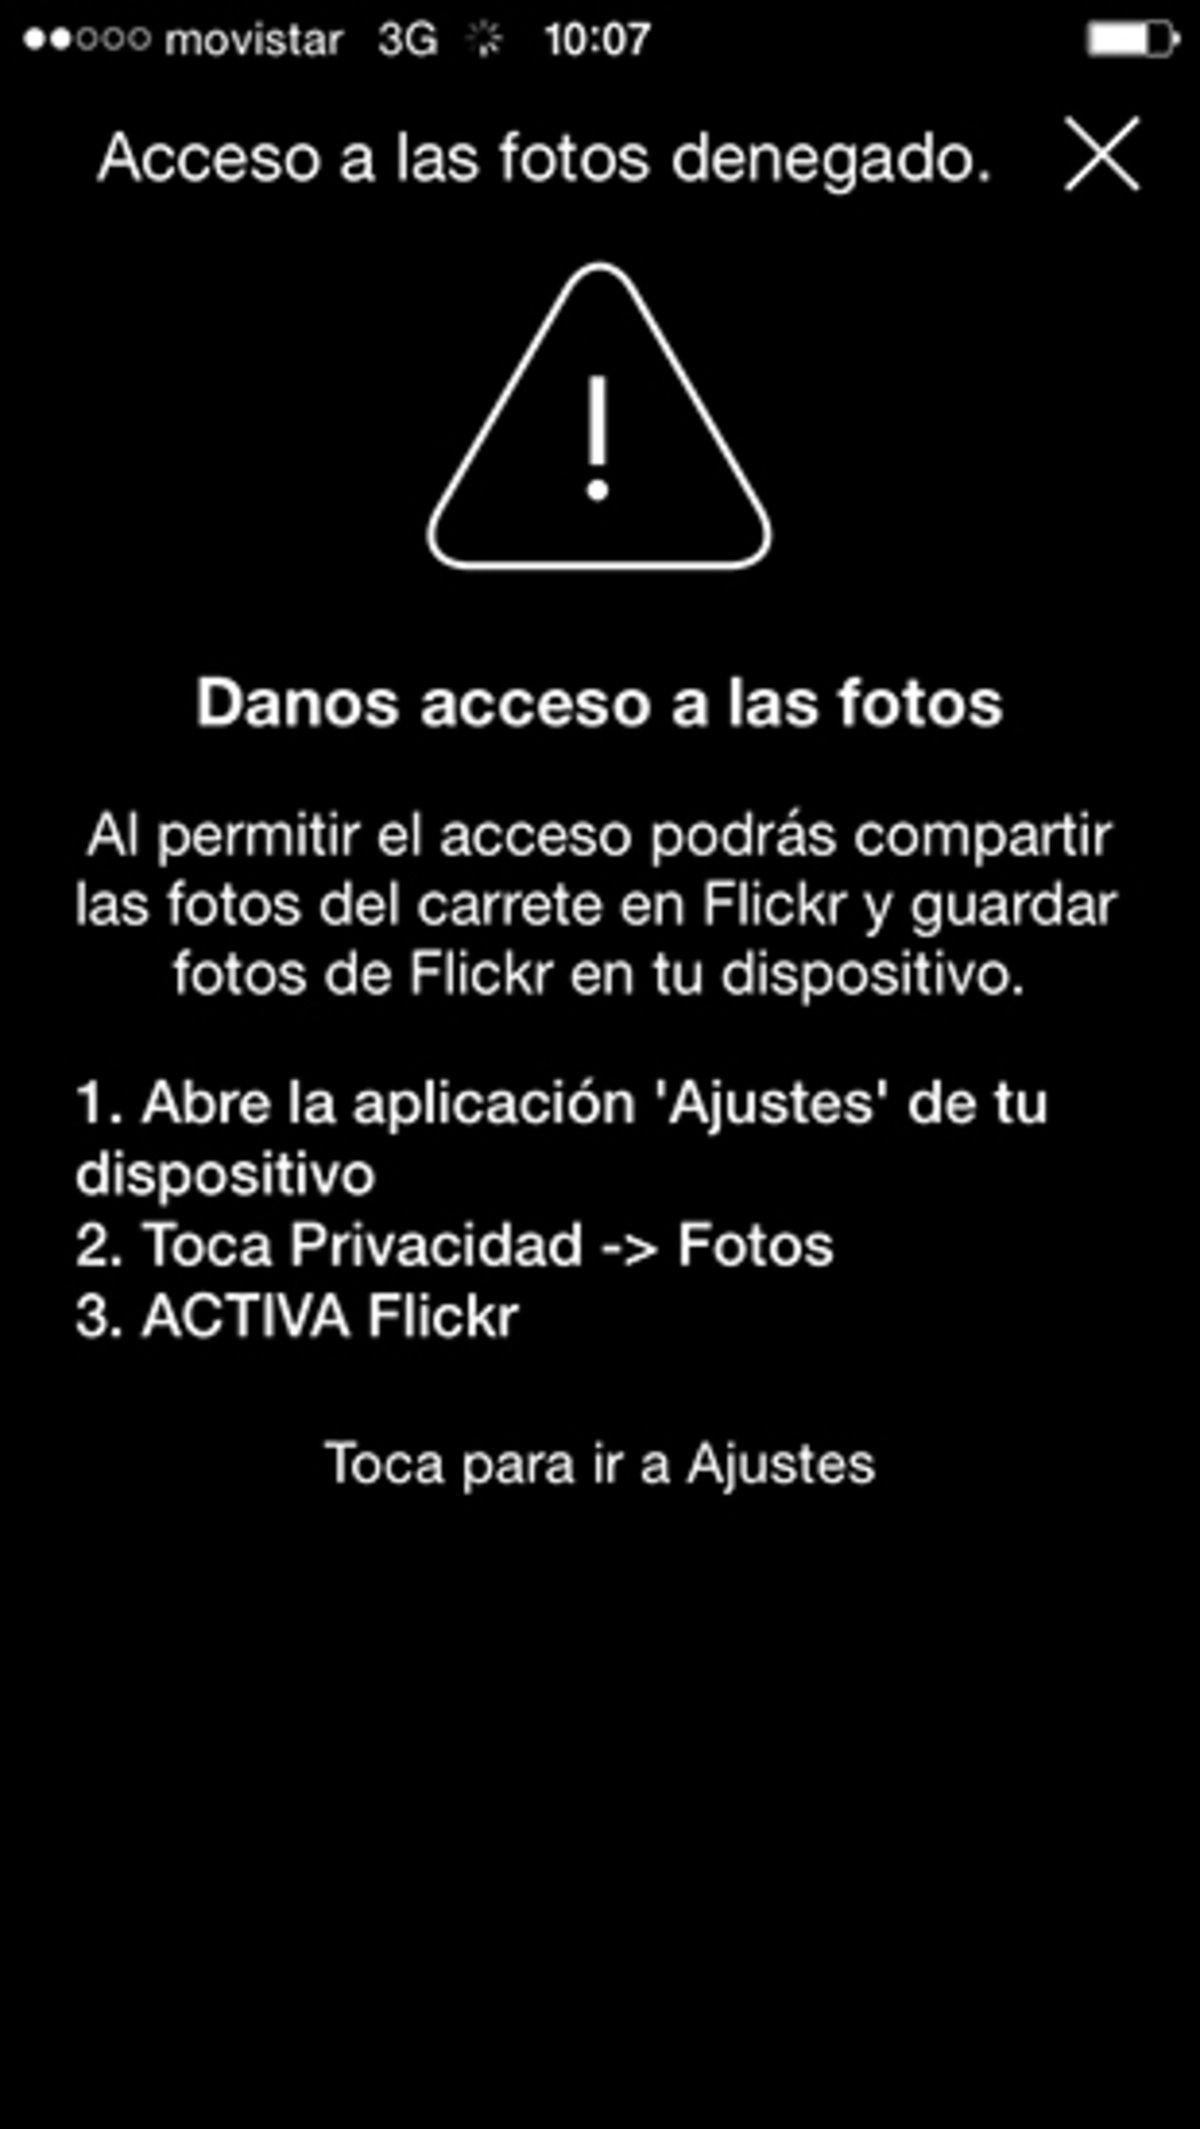 gestionar-permisos-apps-iphone-ipad-1